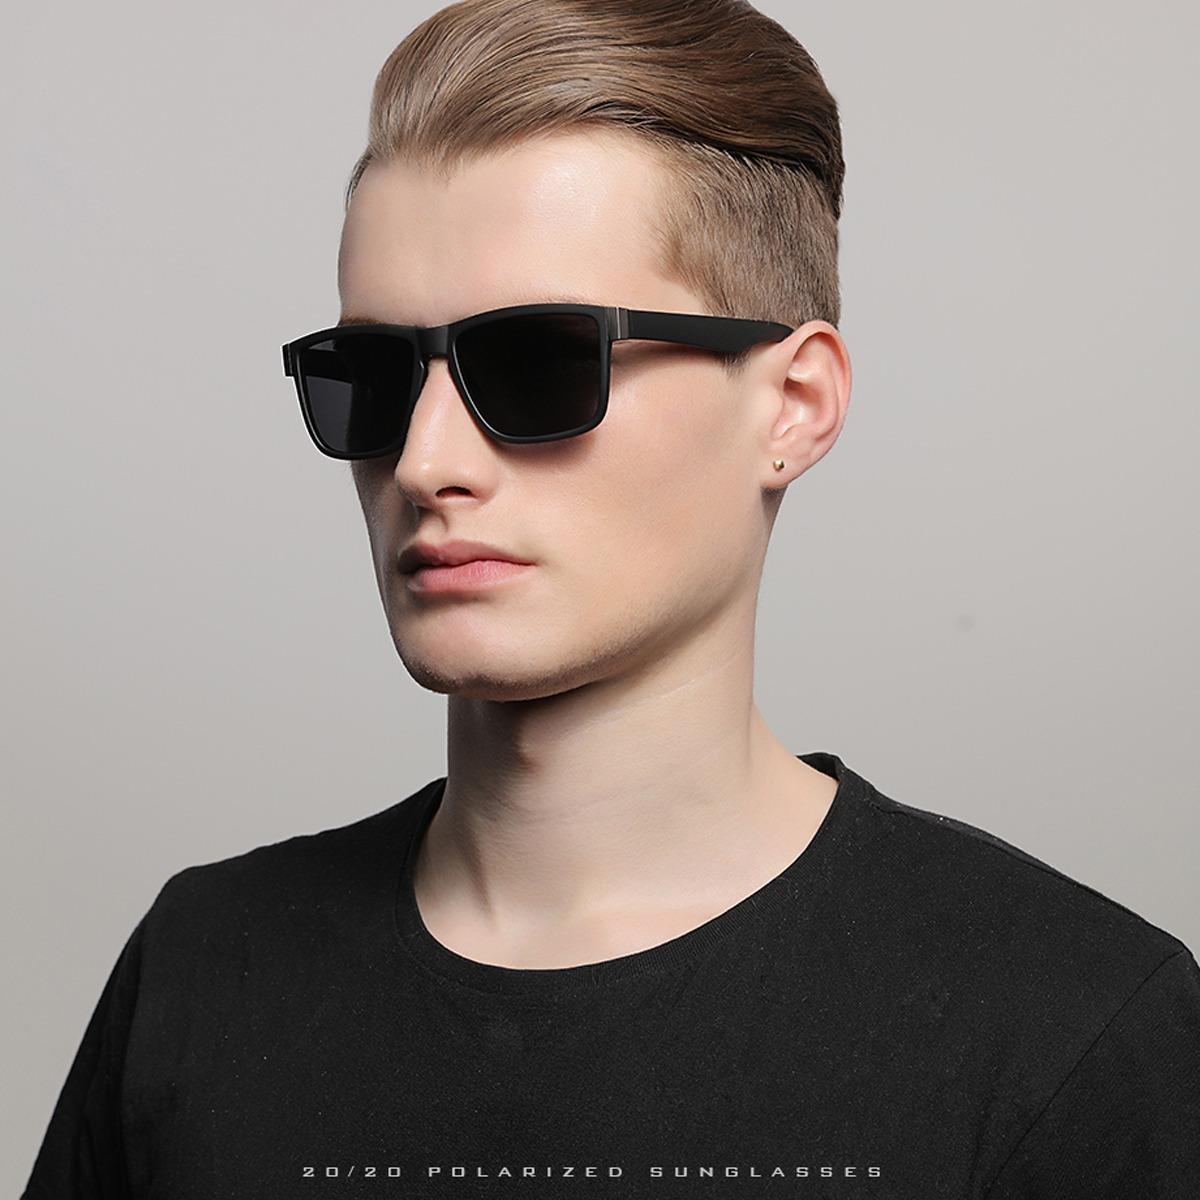 Oculos De Sol Masculino 20 20 Preto Espelhado Oculos Redondo - R  51 ... d5b0b47de0